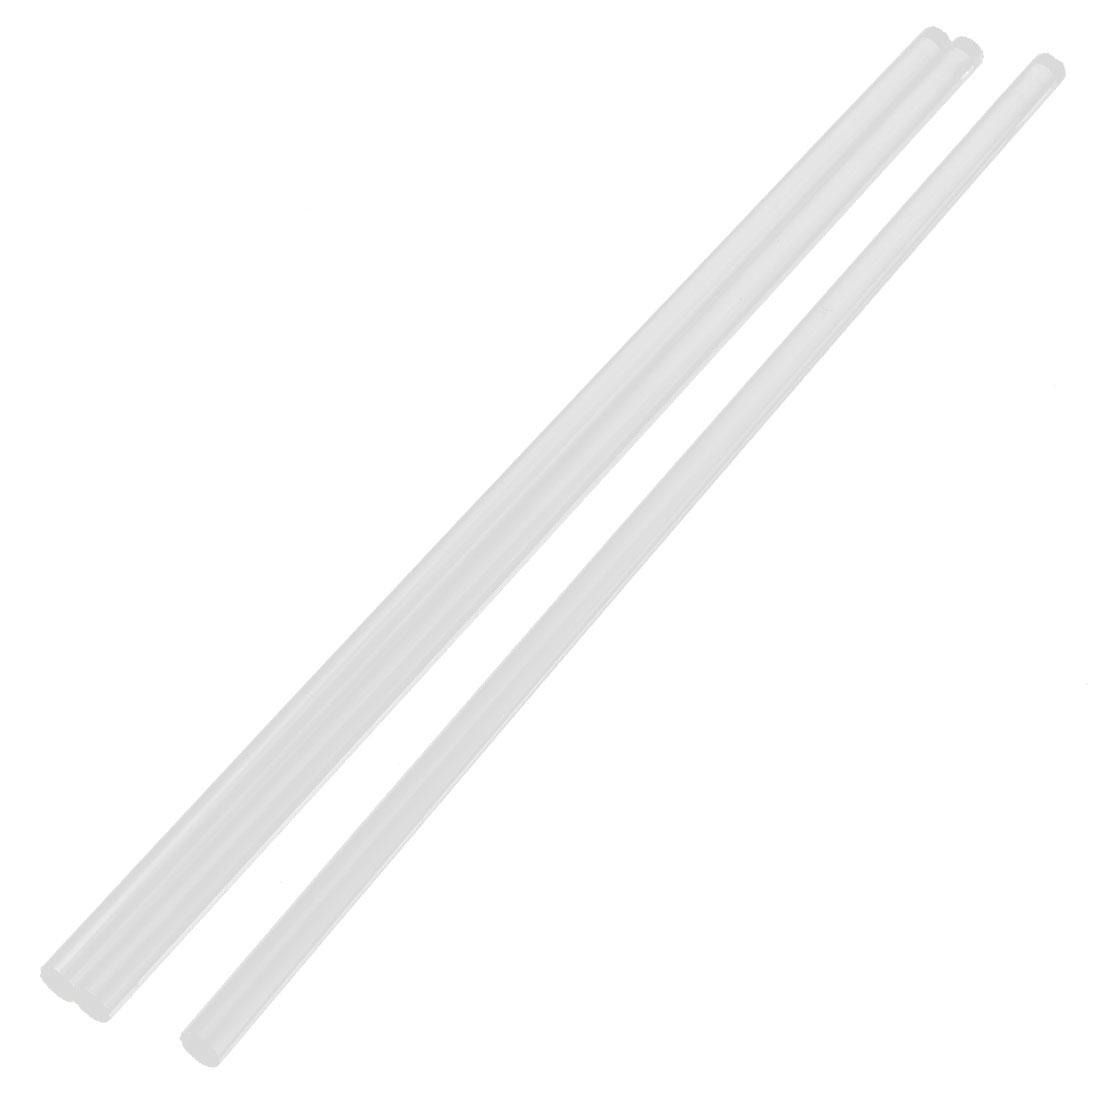 "3Pcs 8mm Dia Clear Round Acrylic Bar PMMA Circular Rod 12"" Length"